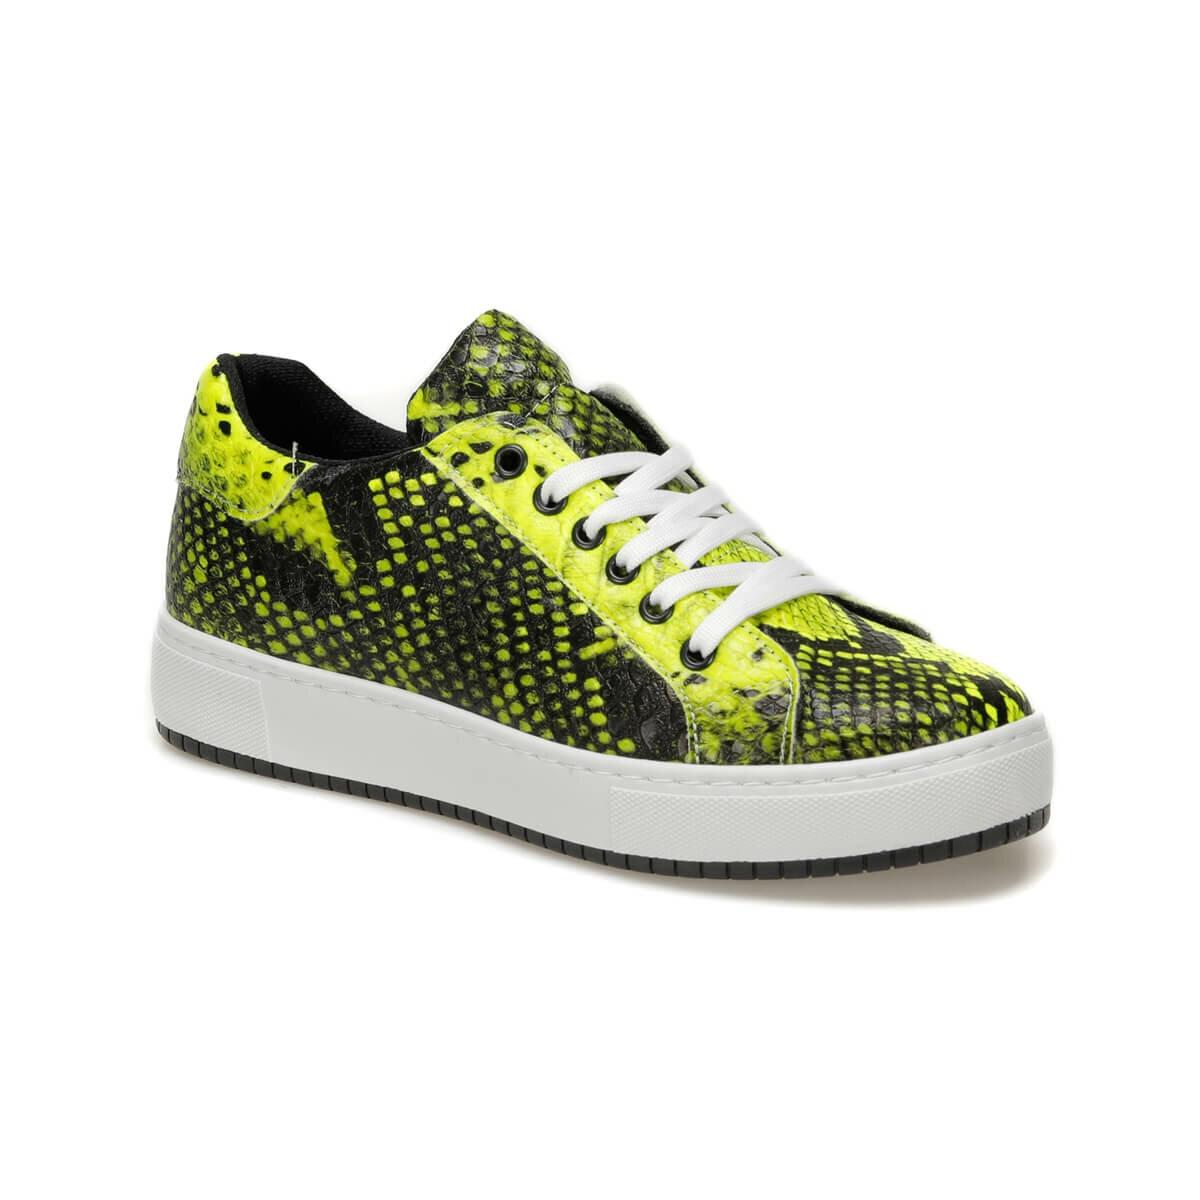 FLO LARUE21Z SKIN Black Women 'S Sneaker Shoes BUTIGO